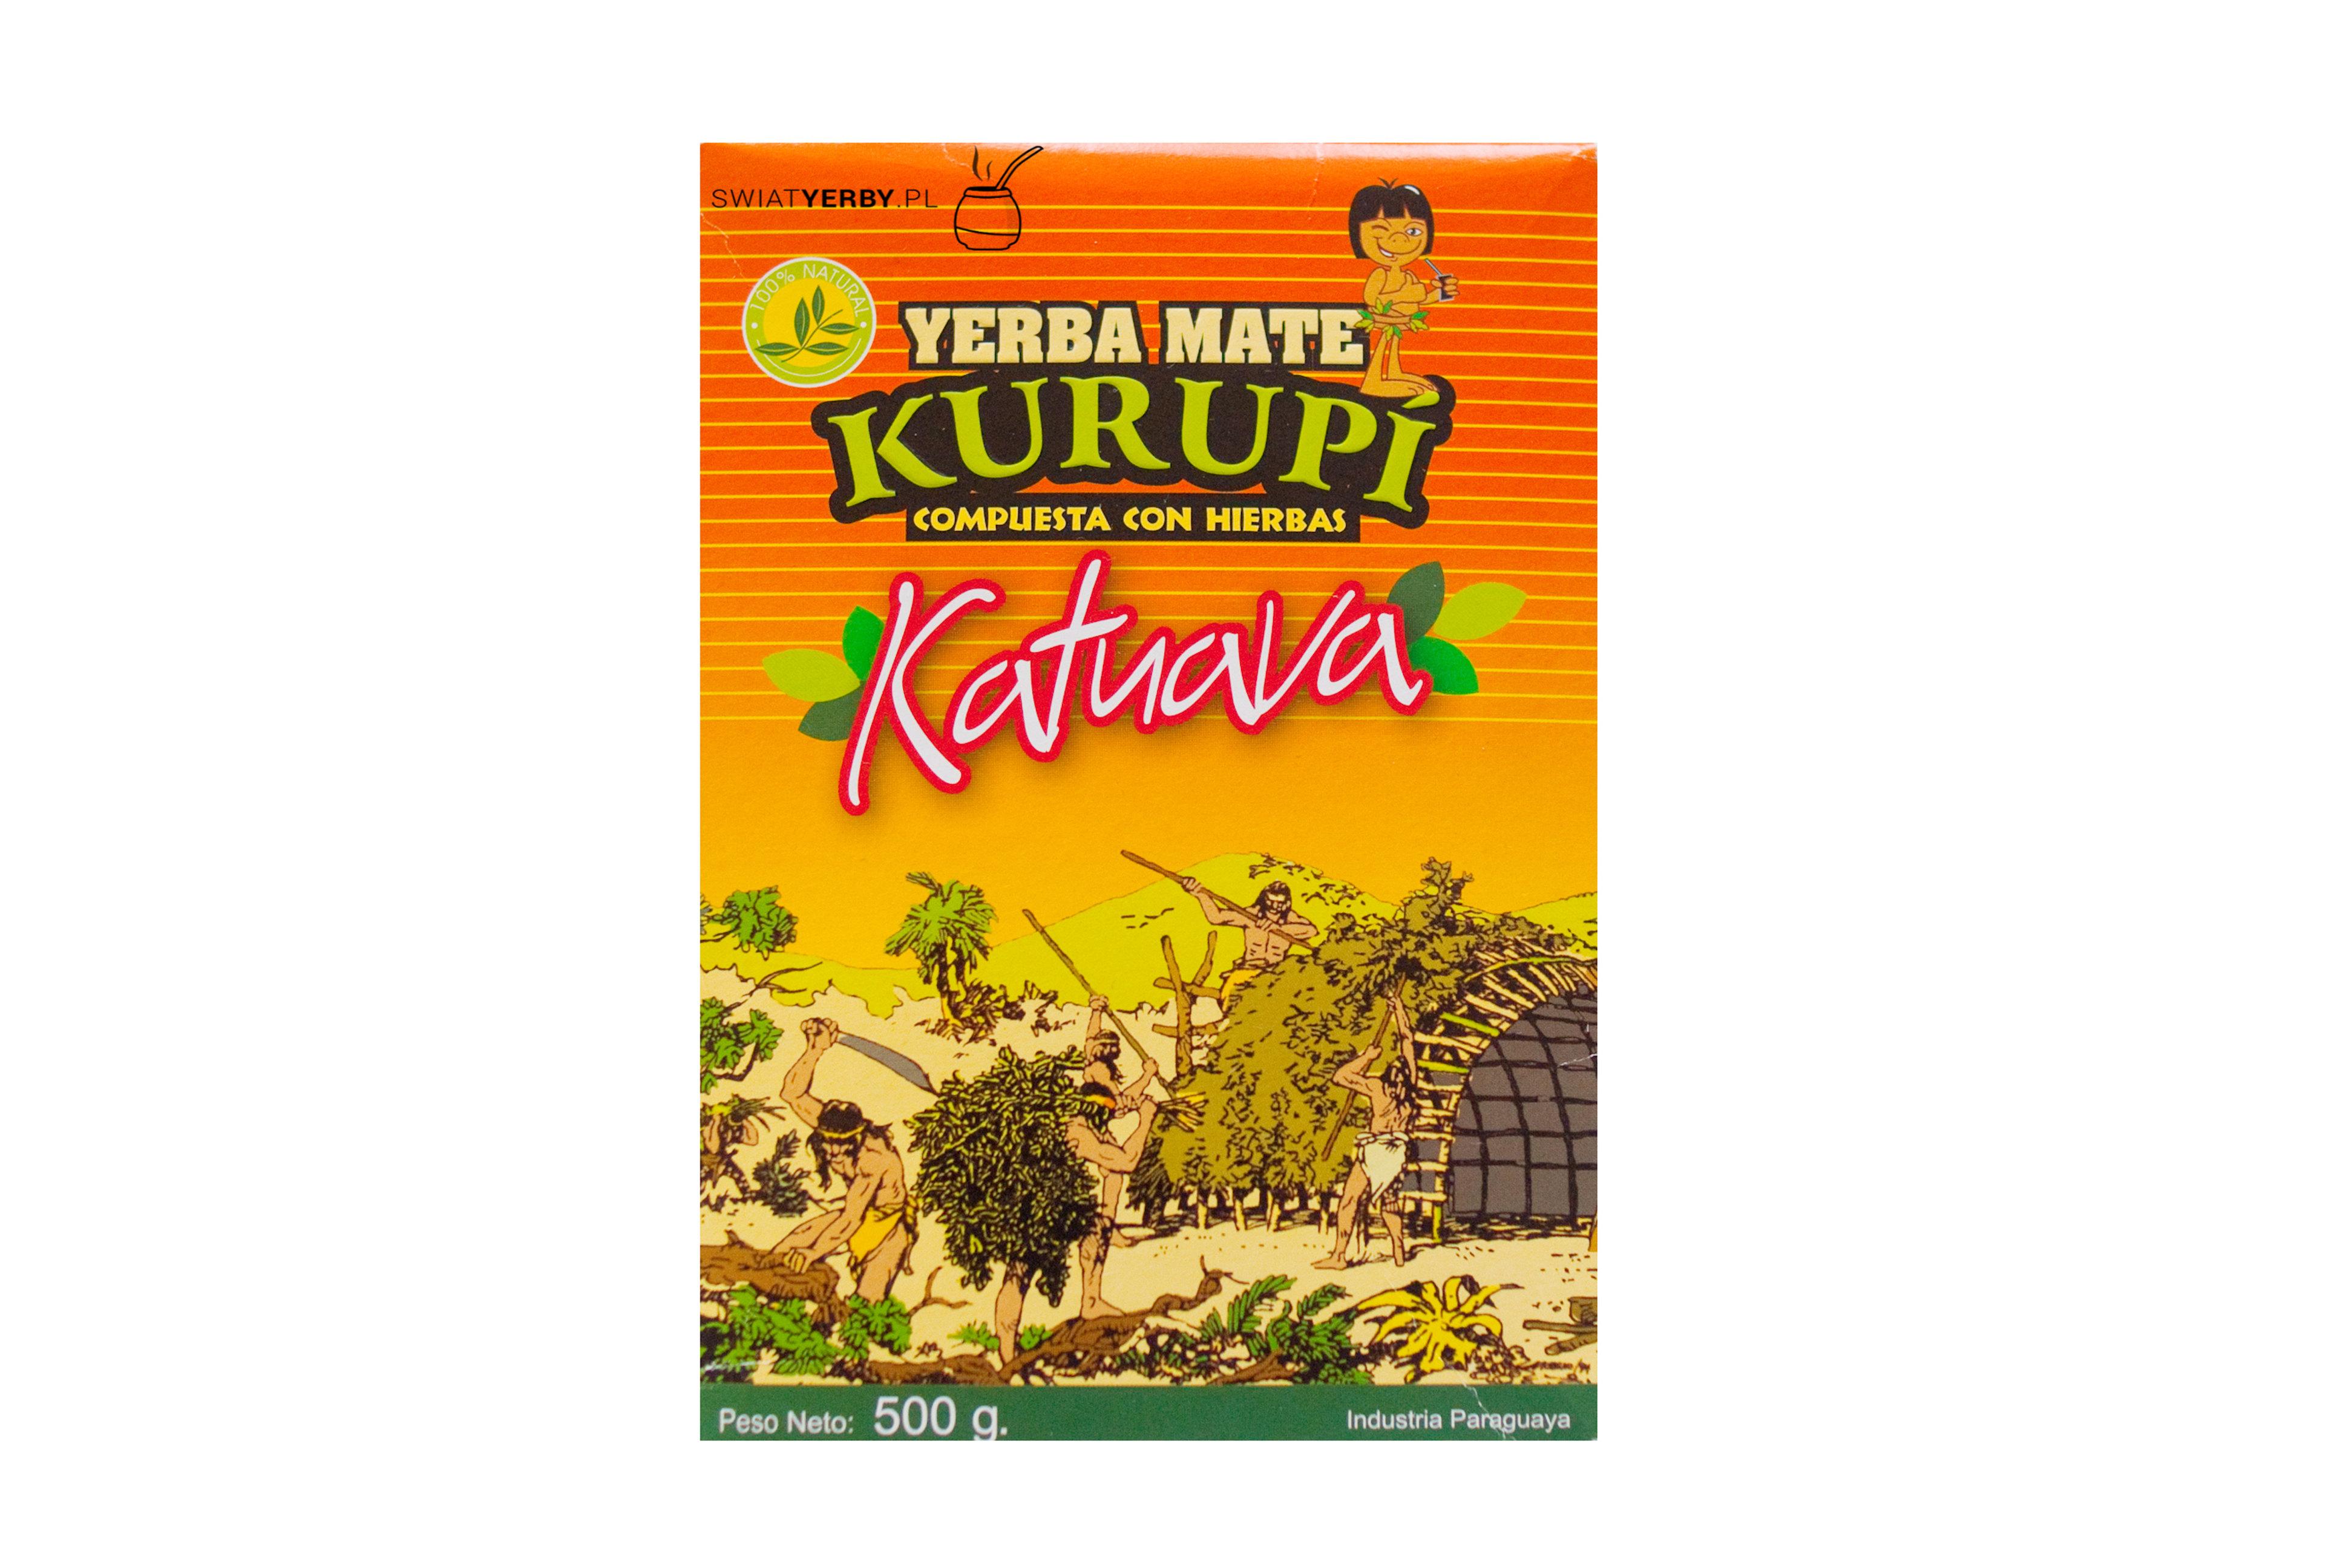 Kurupi Katuava opakowanie